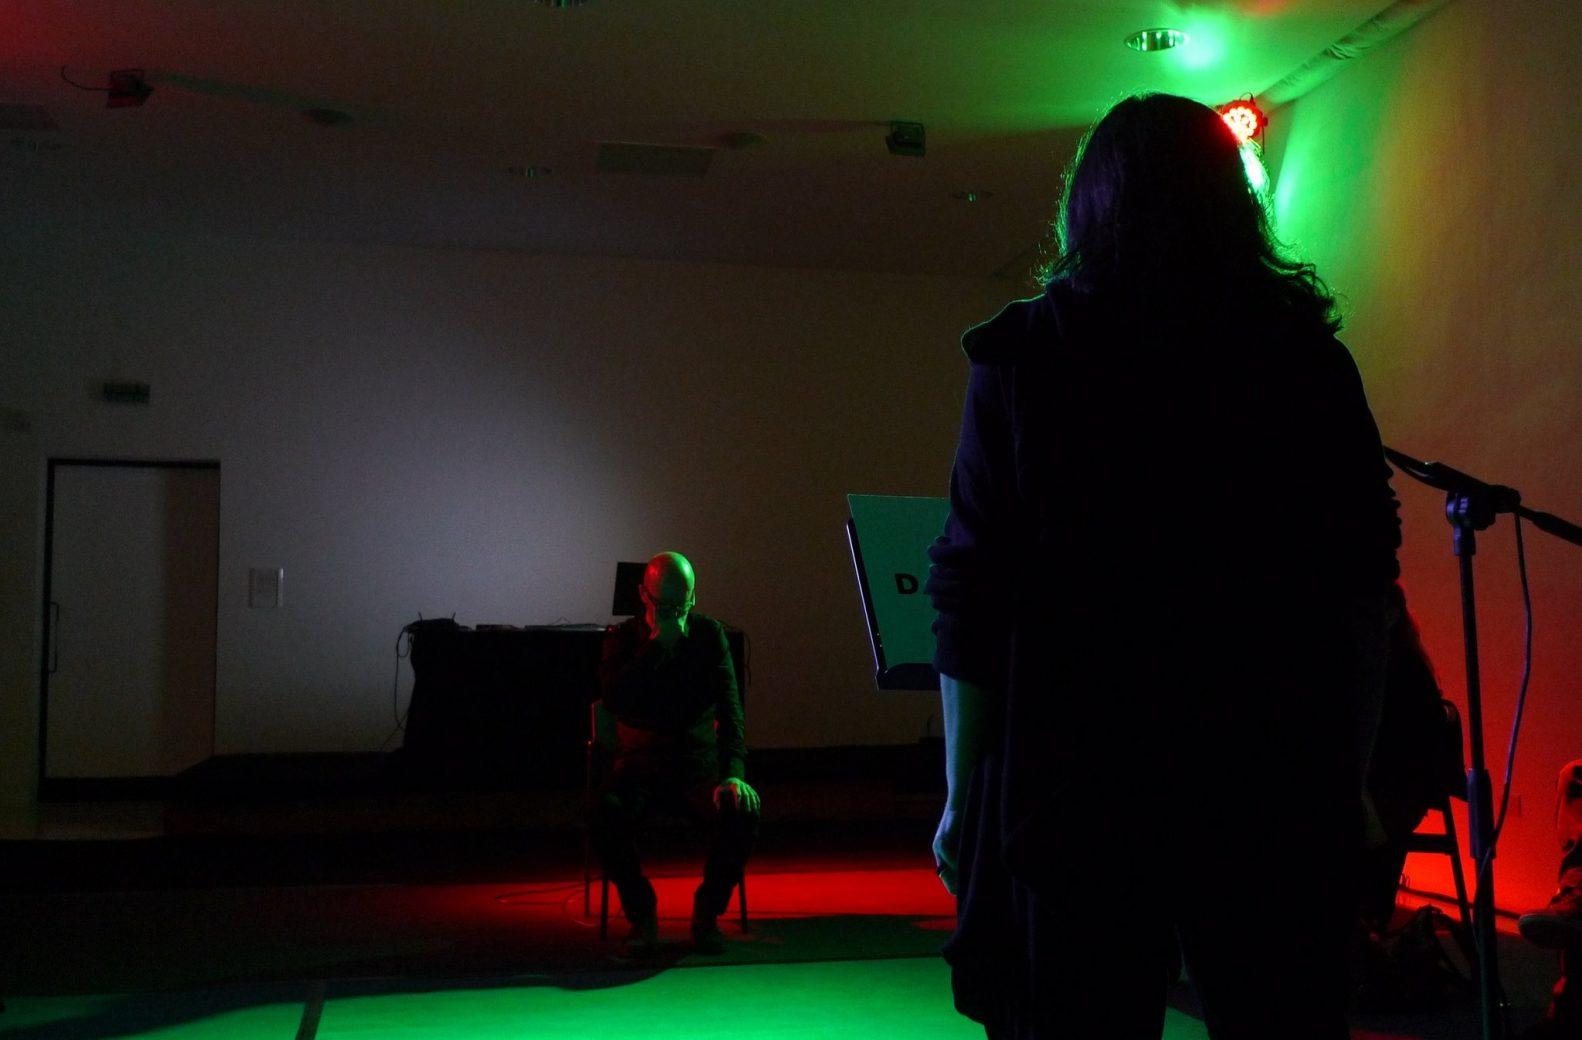 performance-dar-la-voz-negada-3